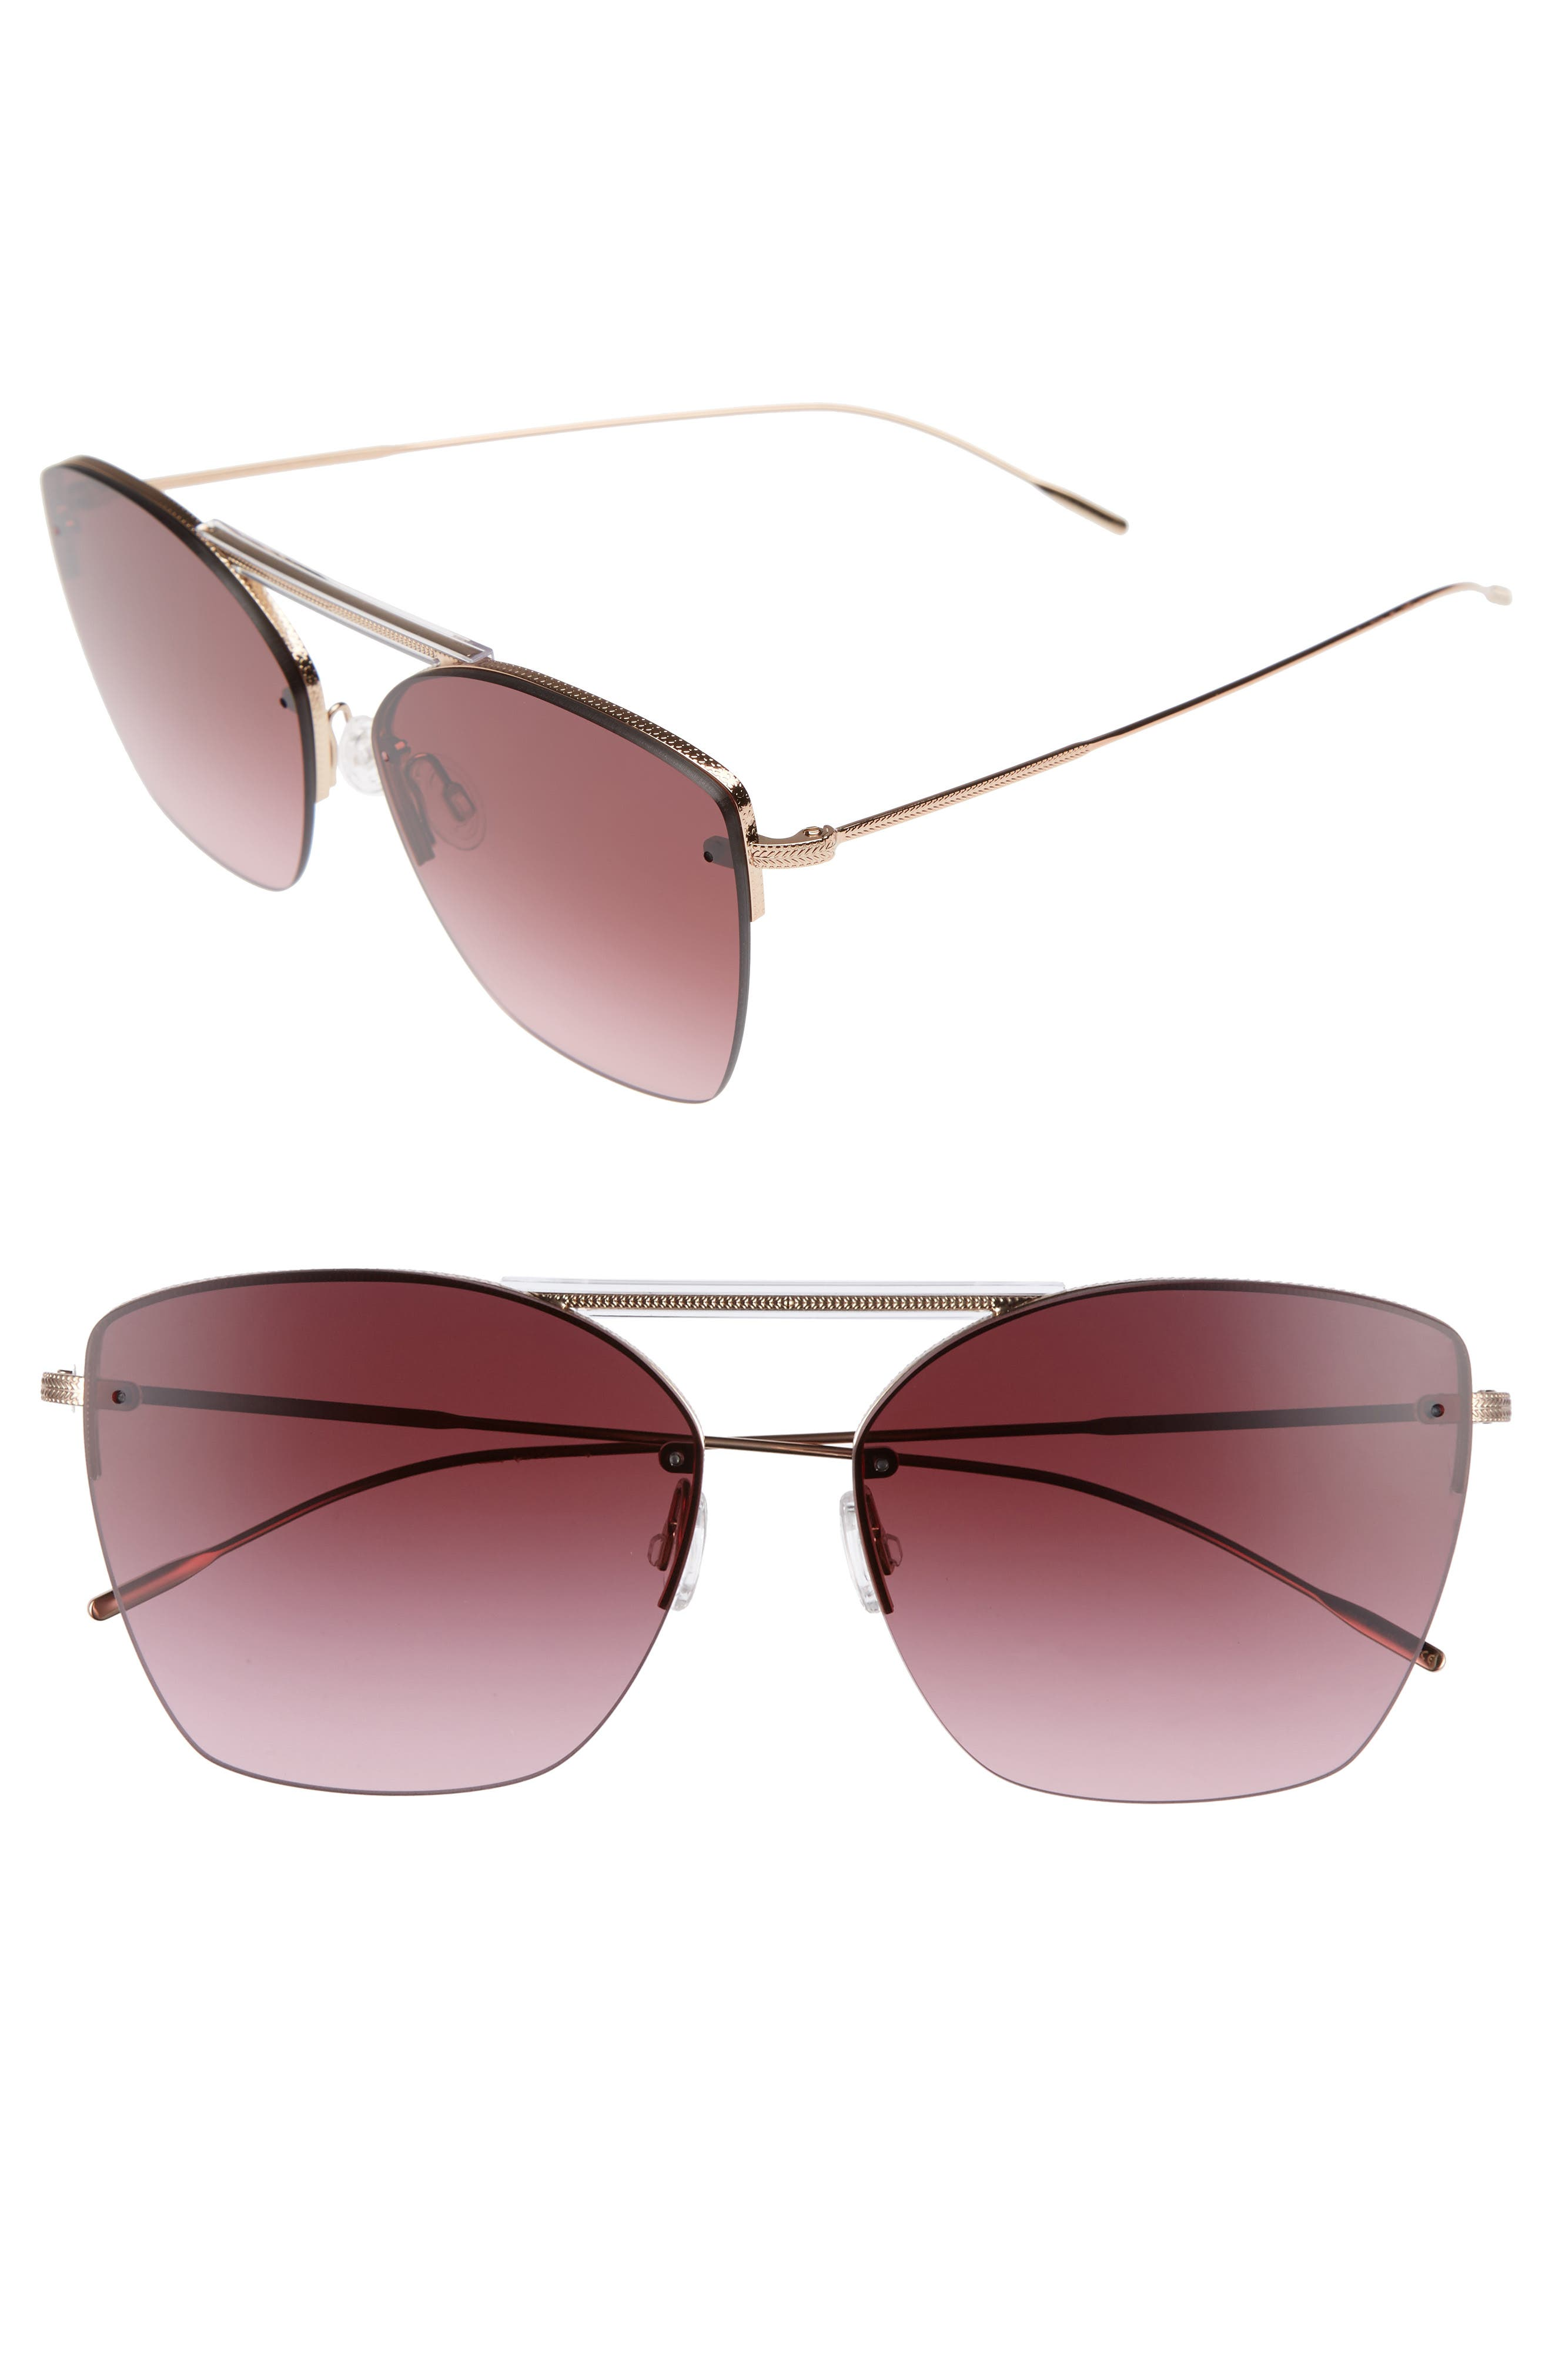 Ziane 61mm Rimless Sunglasses,                         Main,                         color, Marsala